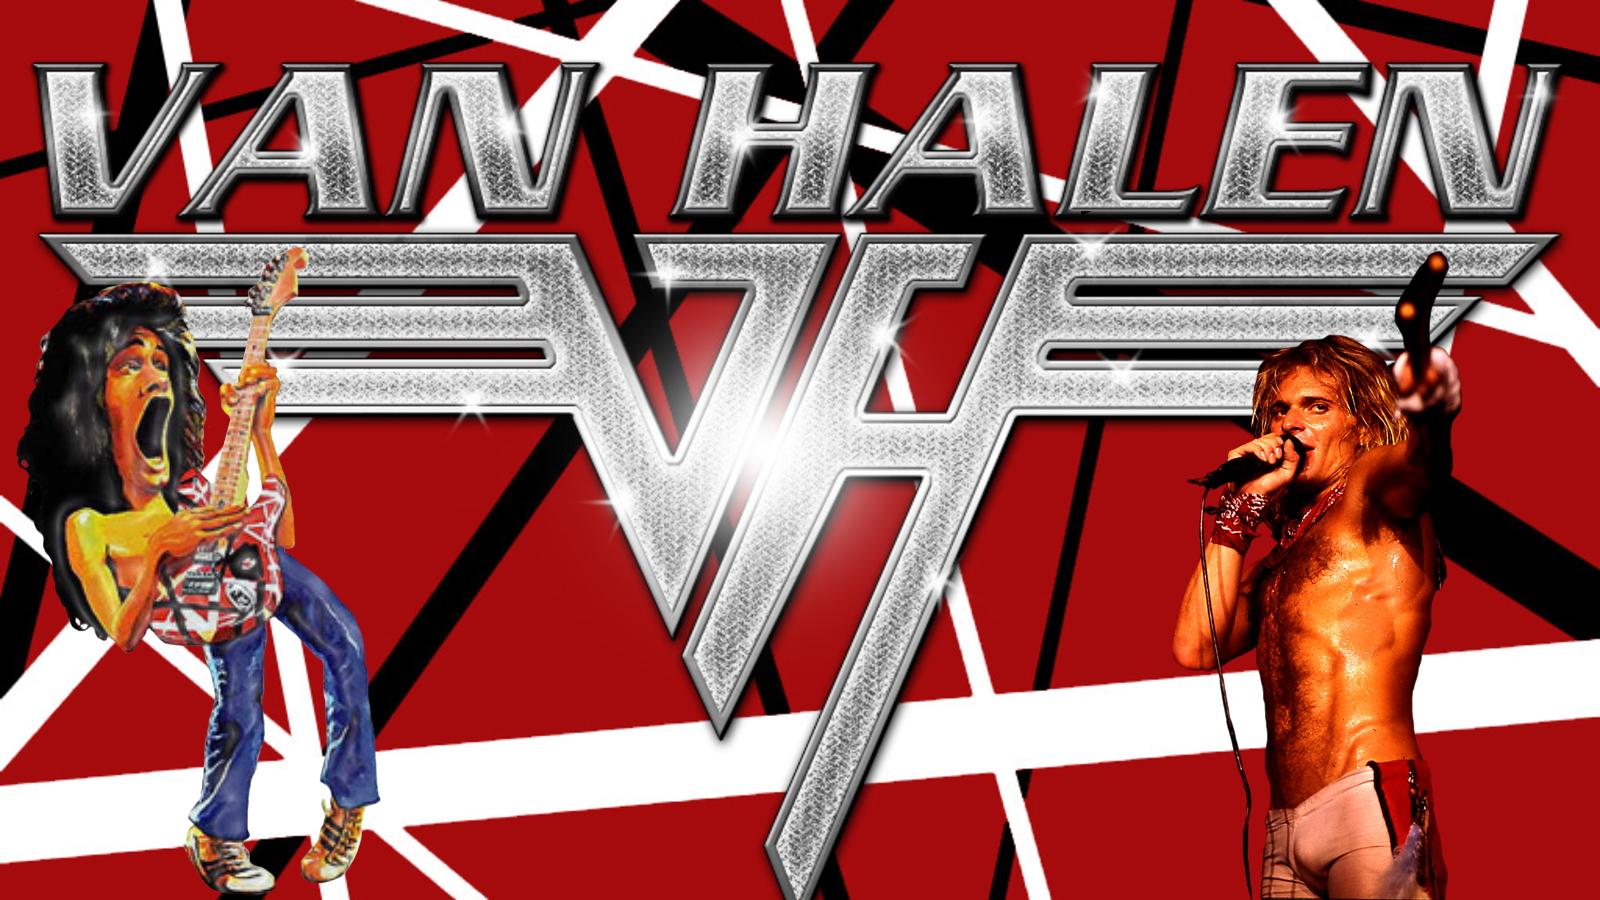 Van Halen Wallpaper wallpaper   ForWallpapercom 1600x900